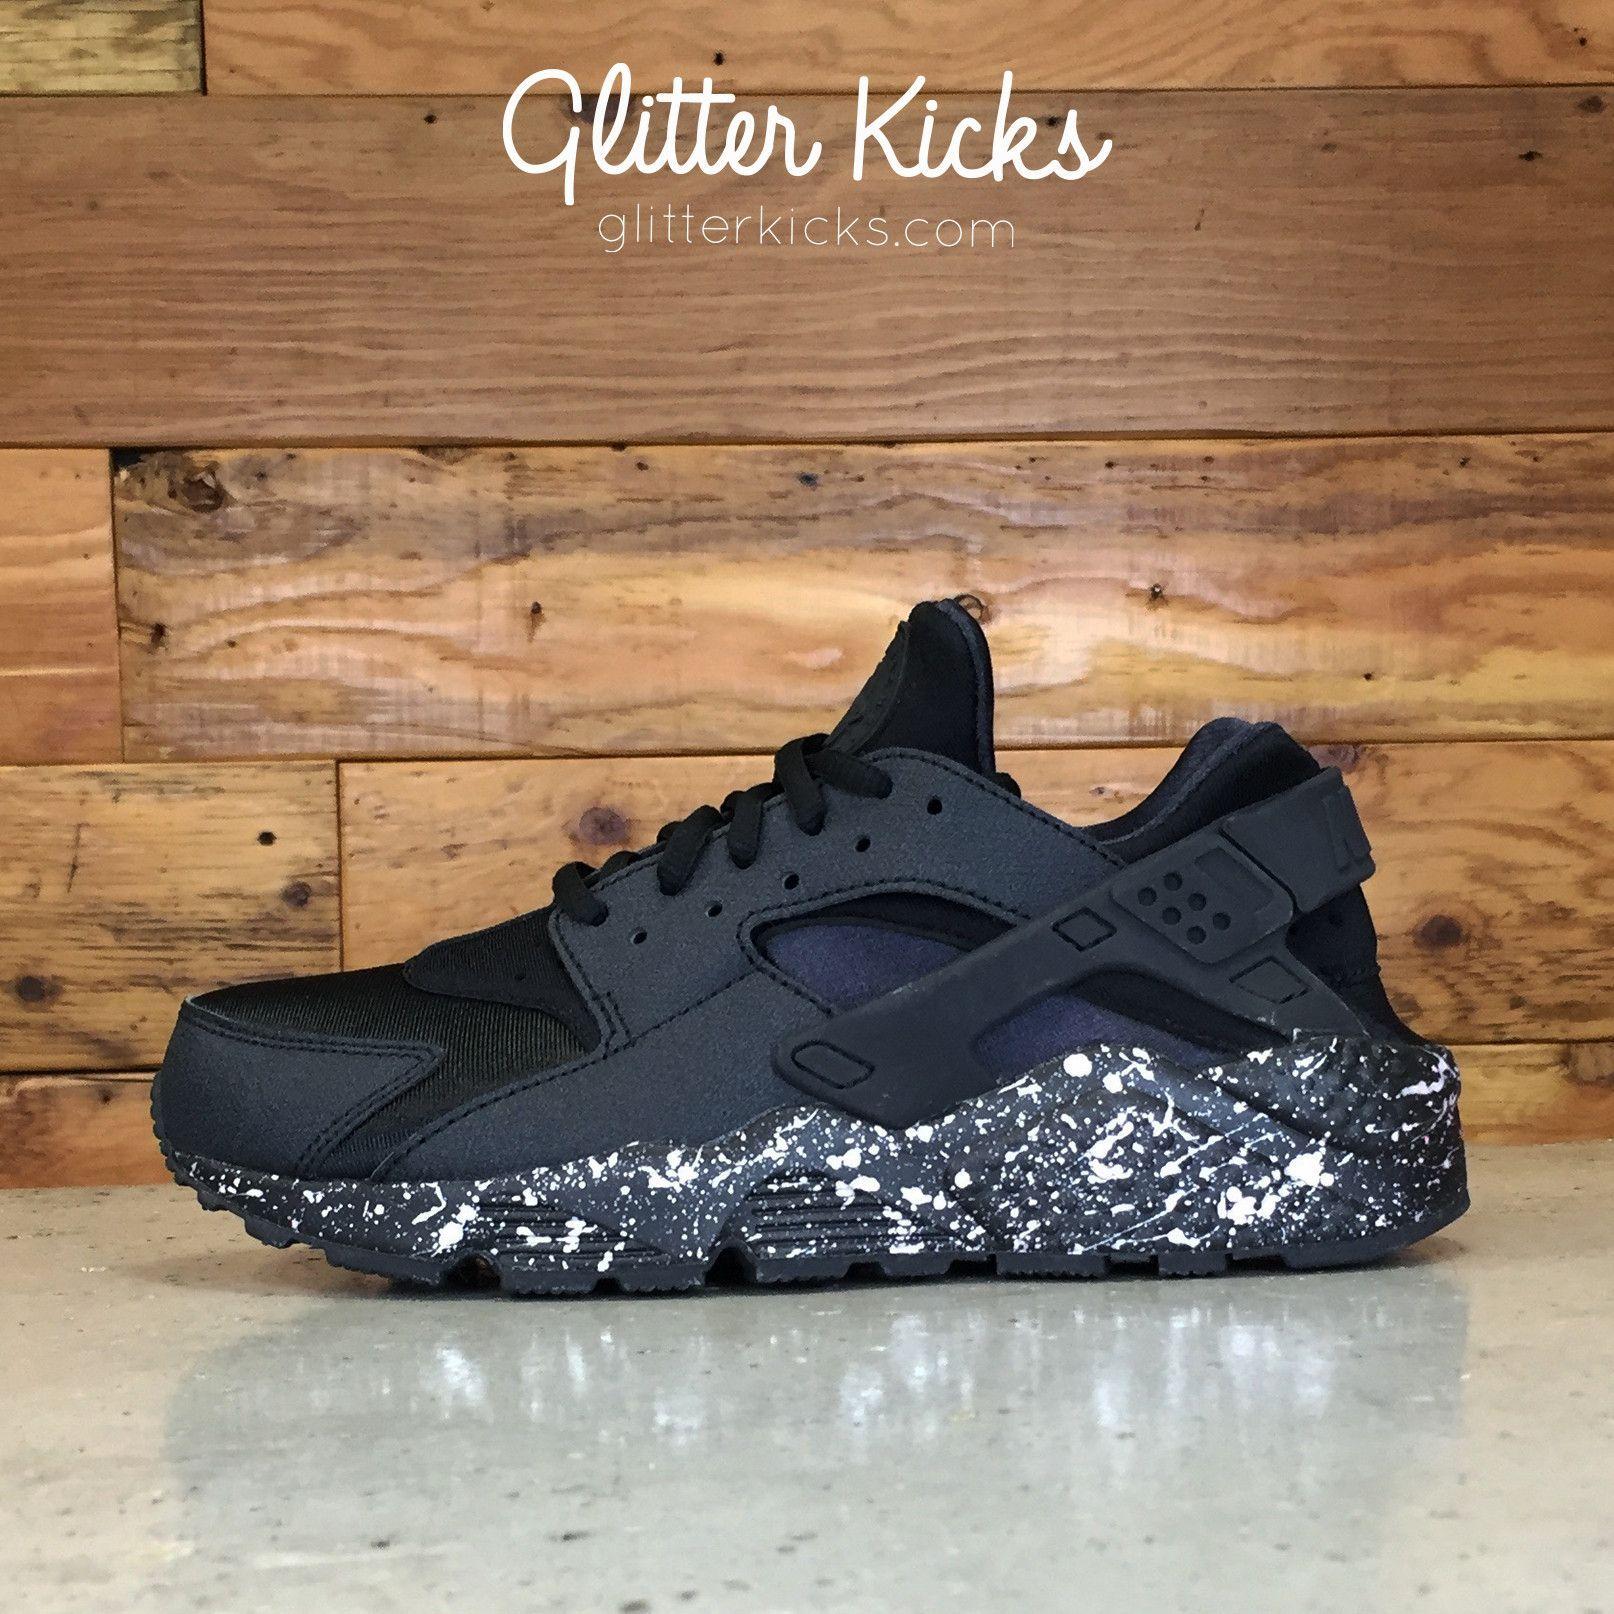 23778c32a7ec Nike Air Huarache Run Customized by Glitter Kicks - Triple Black   Pearl  Paint Speckle